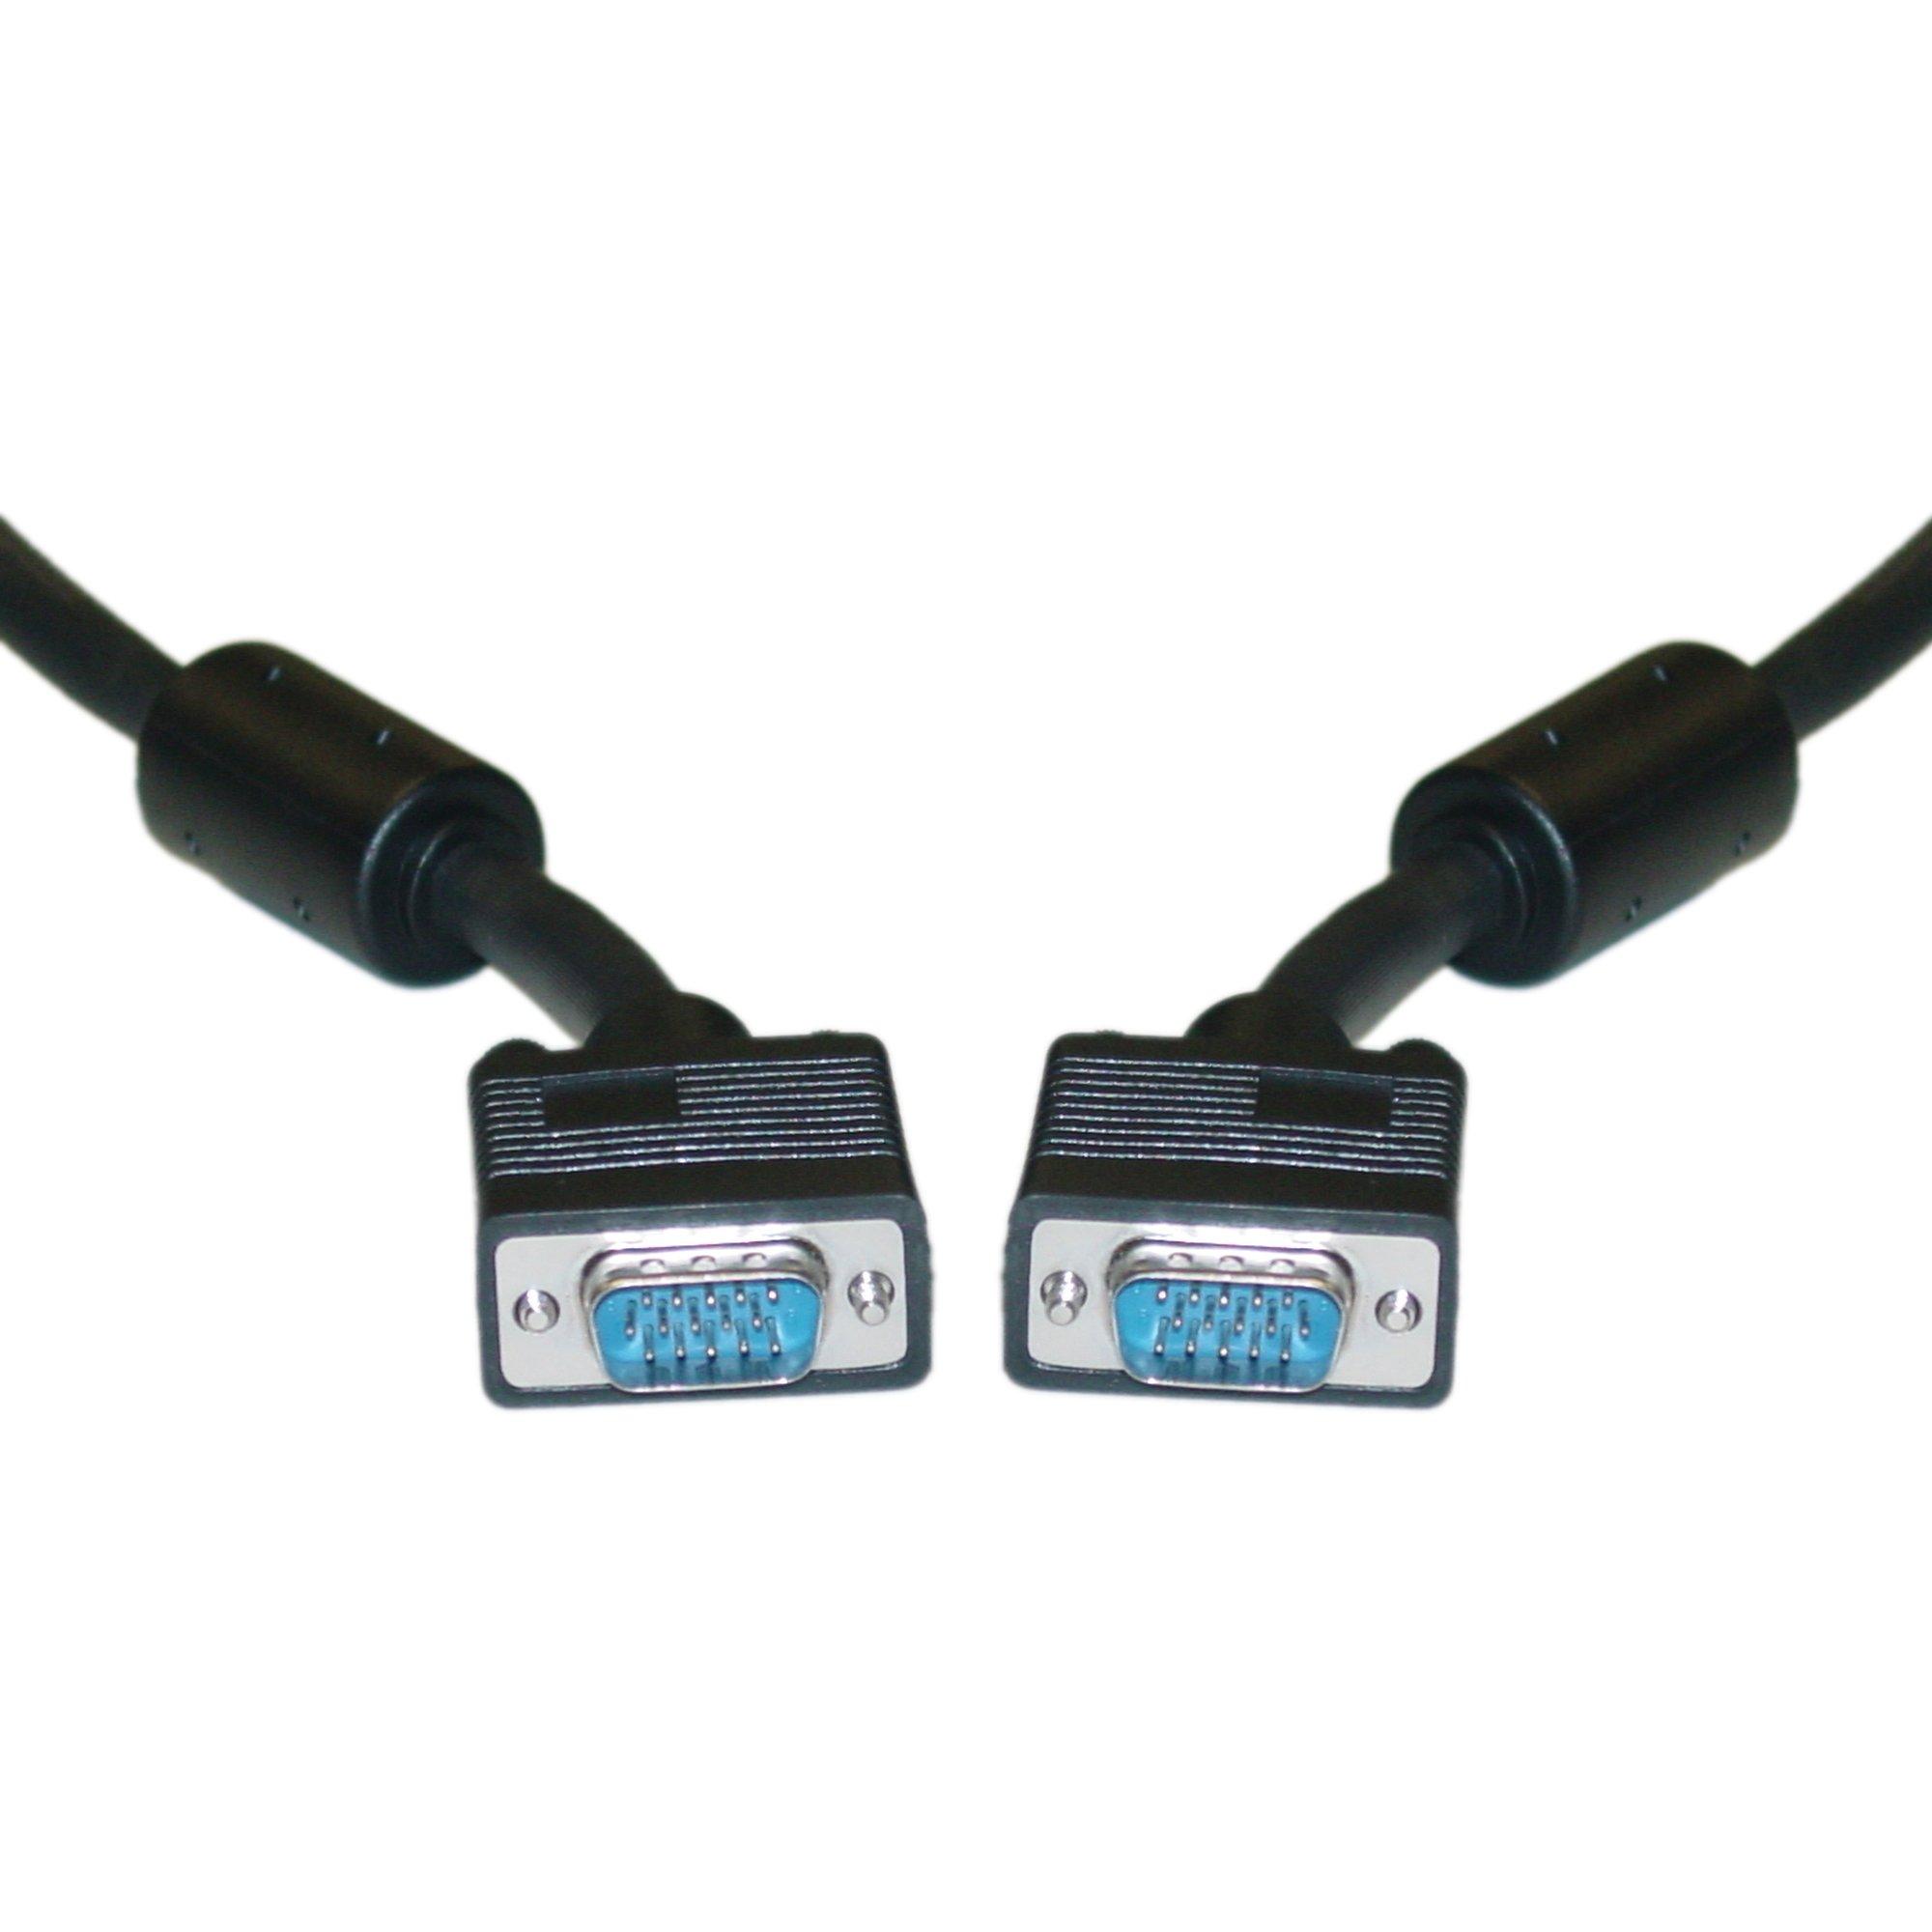 HD15 (SVGA) Male / HD15 (SVGA) Male, Coaxial, with Ferrite Bead, Black, 150 ft